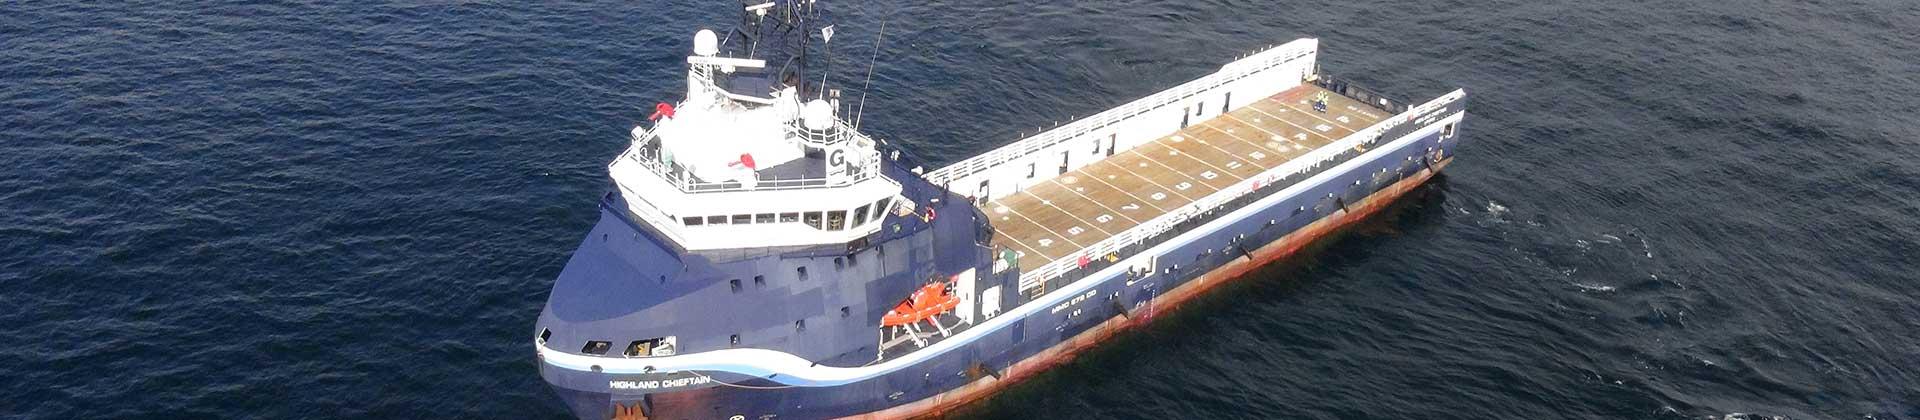 Vessel Highland Chieftain